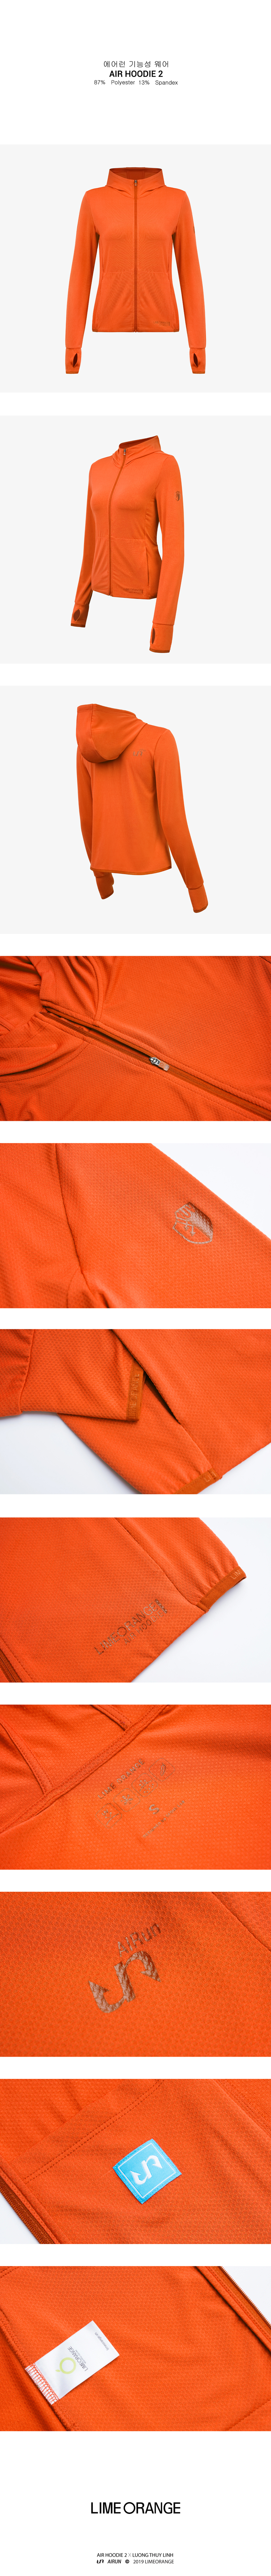 Áo khoác nữ Air Hoodie LO19707101-O 2